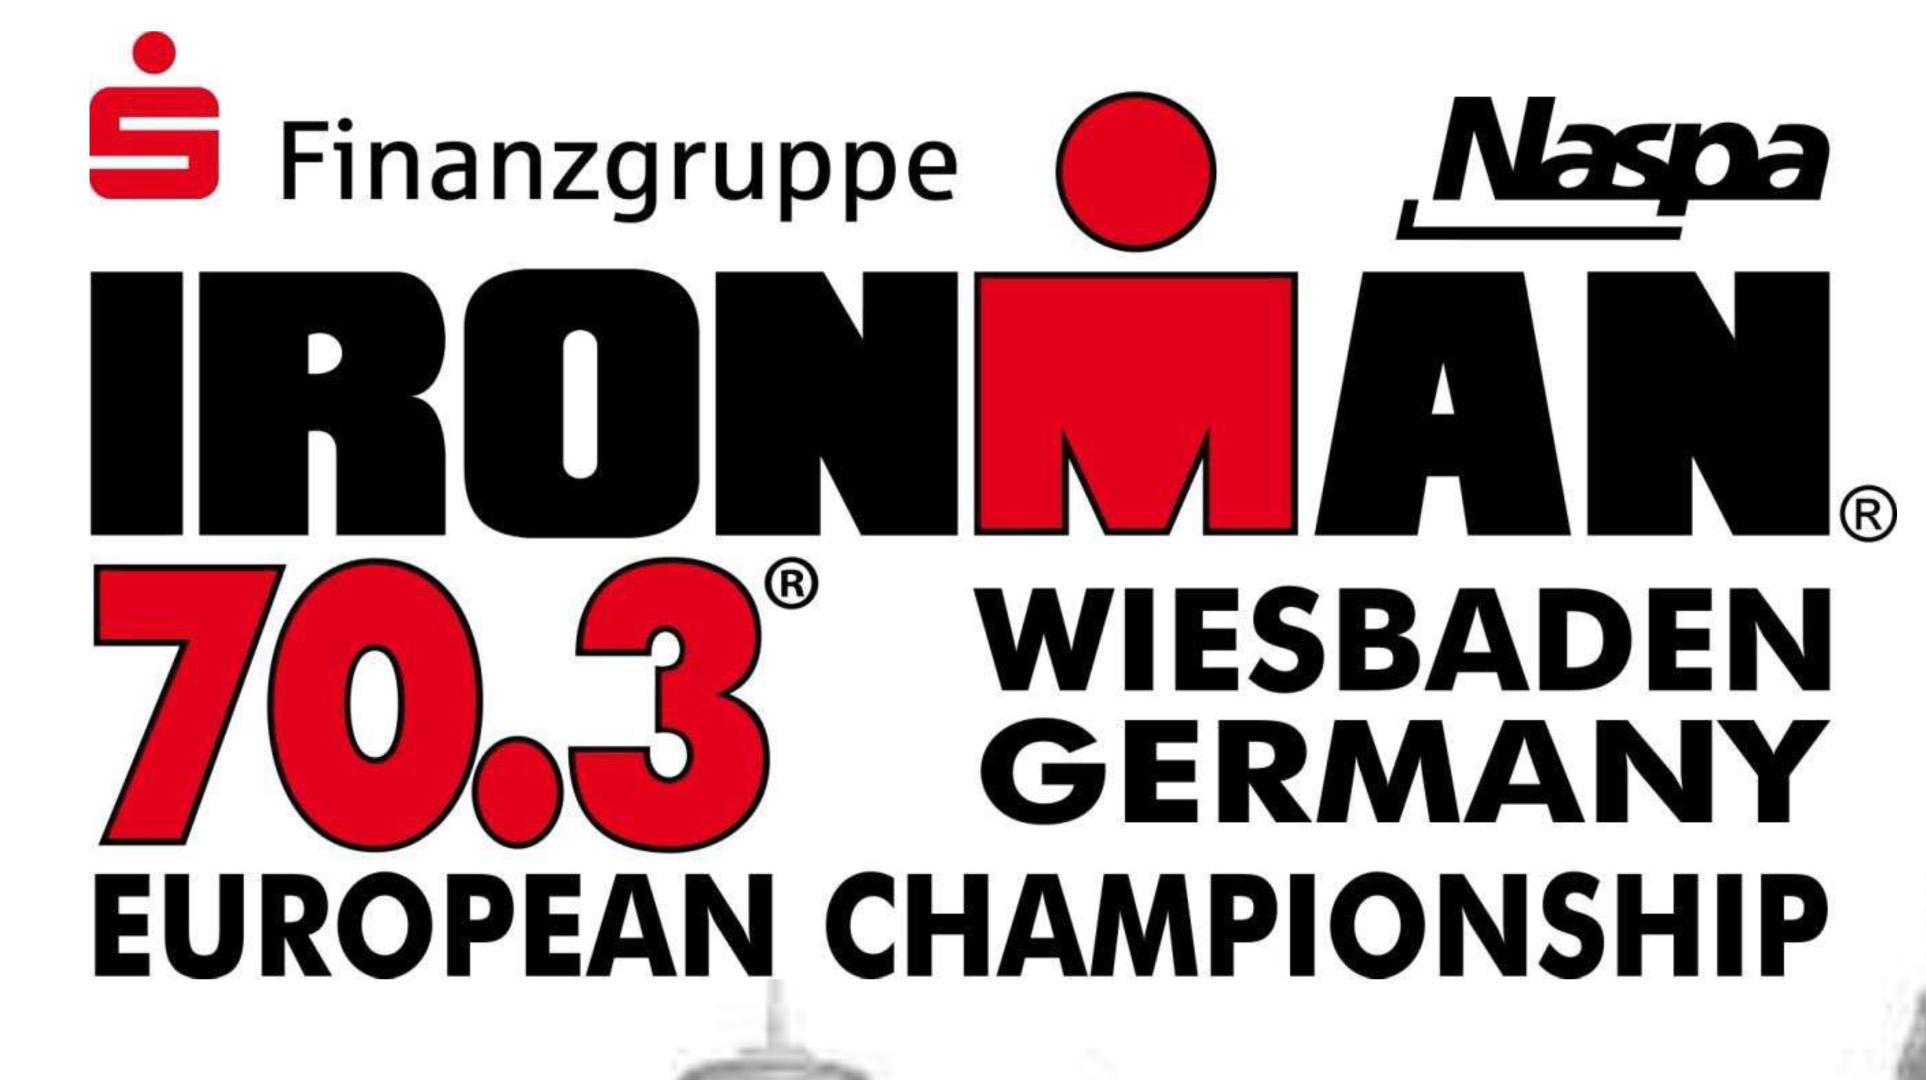 IRONMAN 70.3 Wiesbaden: le championnat d'Europe attire du monde !!!